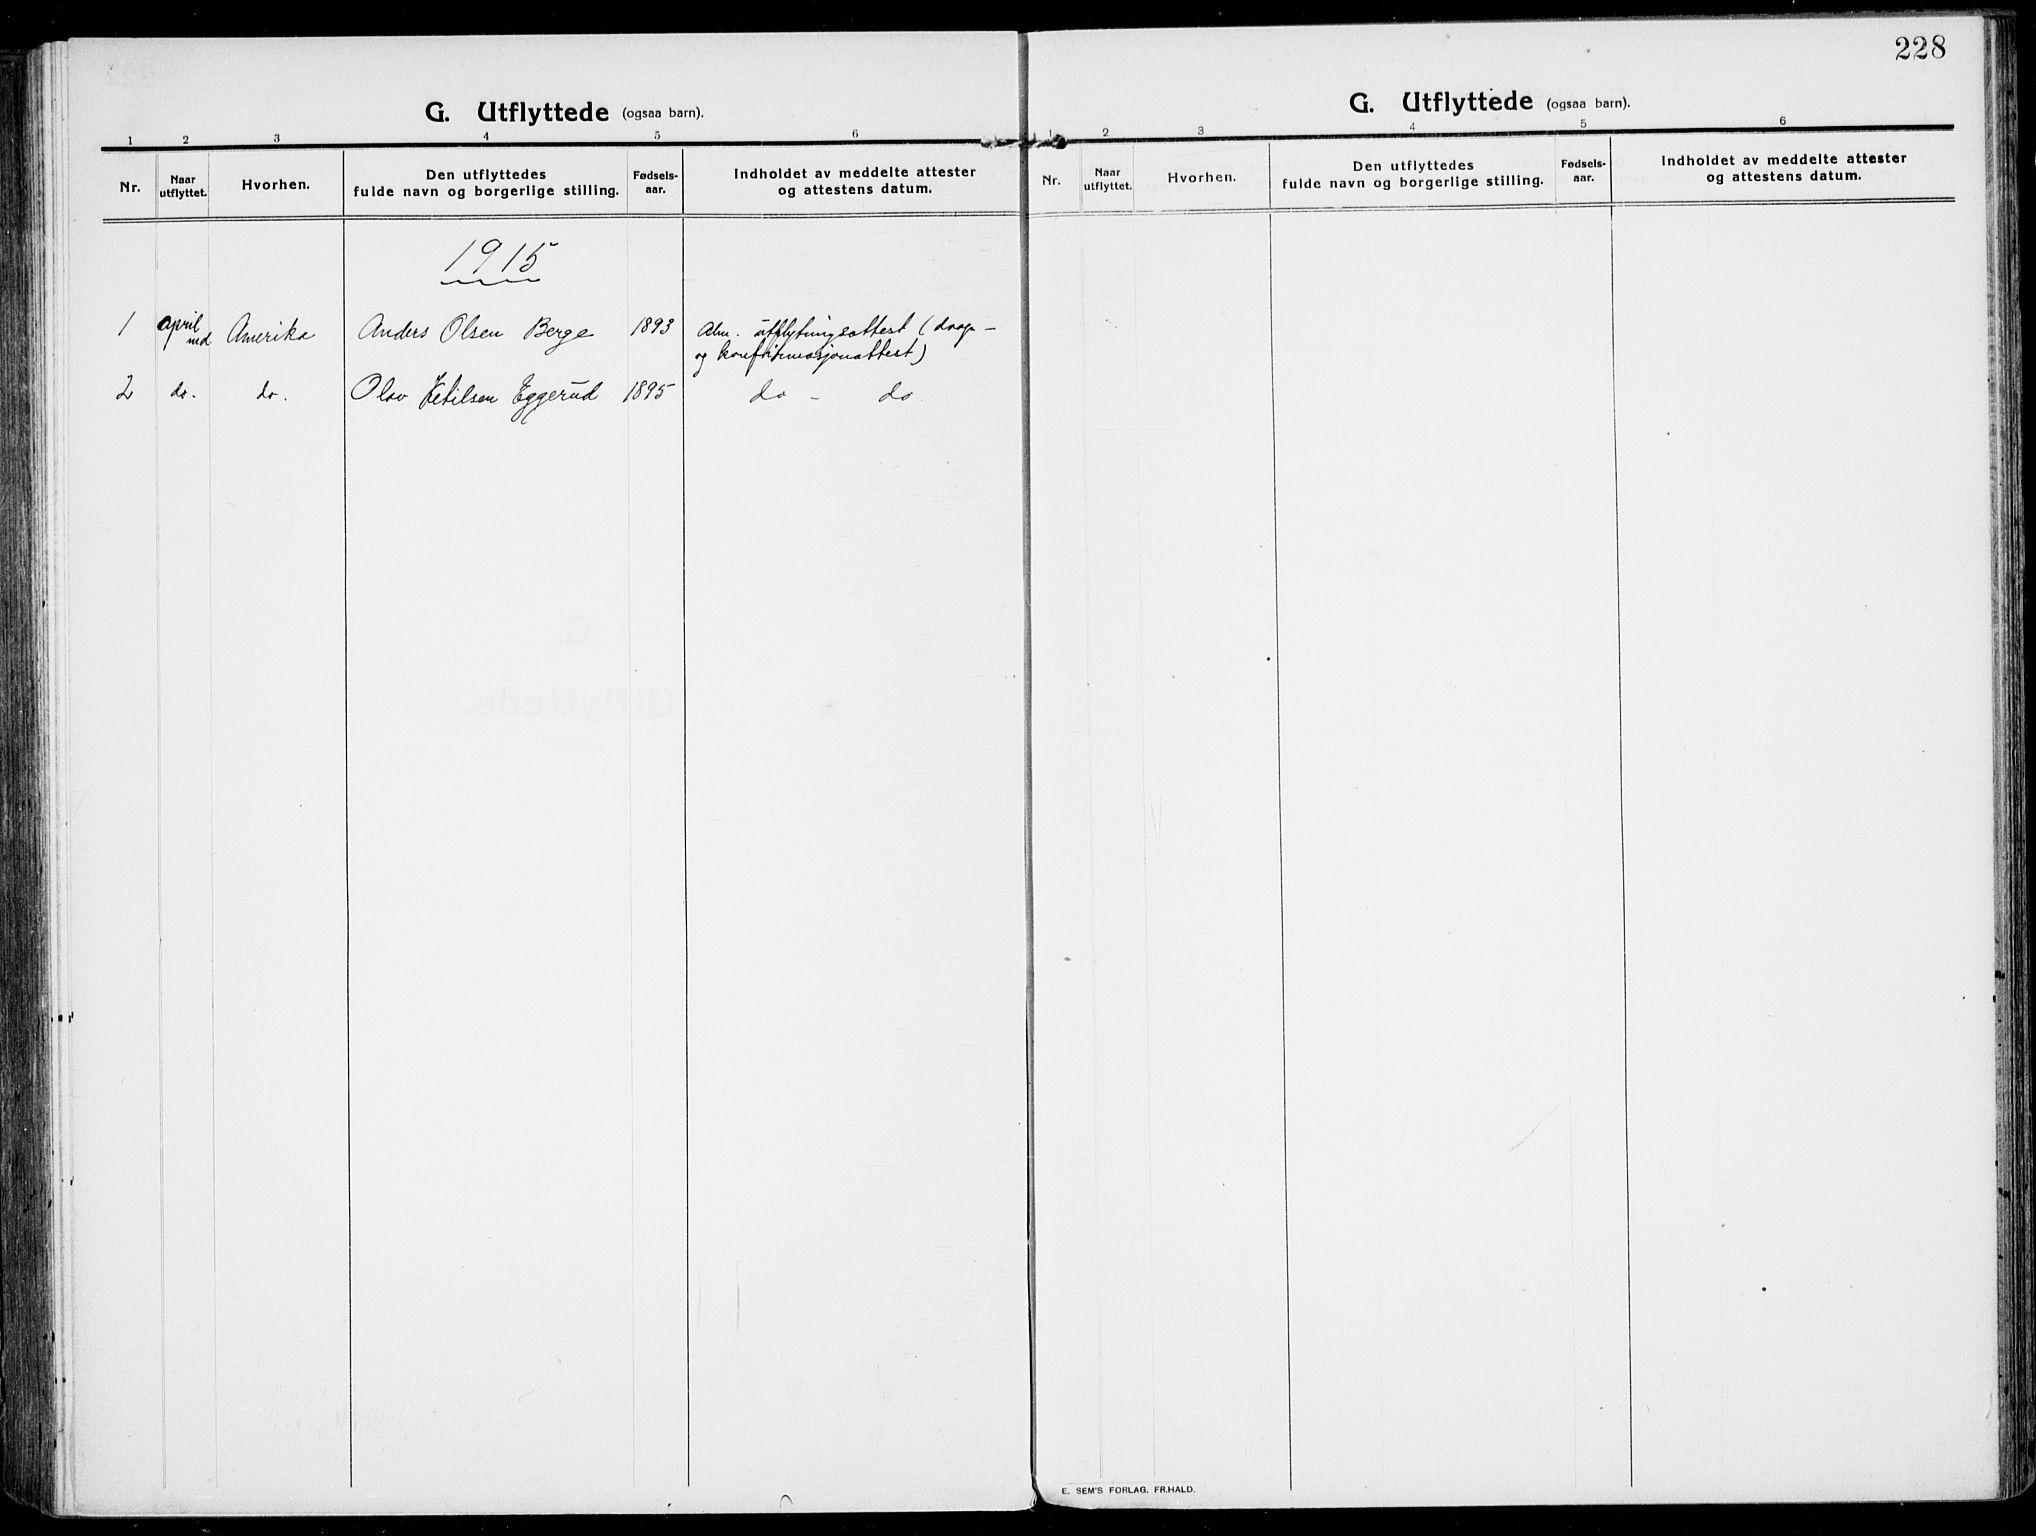 SAKO, Rjukan kirkebøker, F/Fa/L0002: Ministerialbok nr. 2, 1912-1917, s. 228